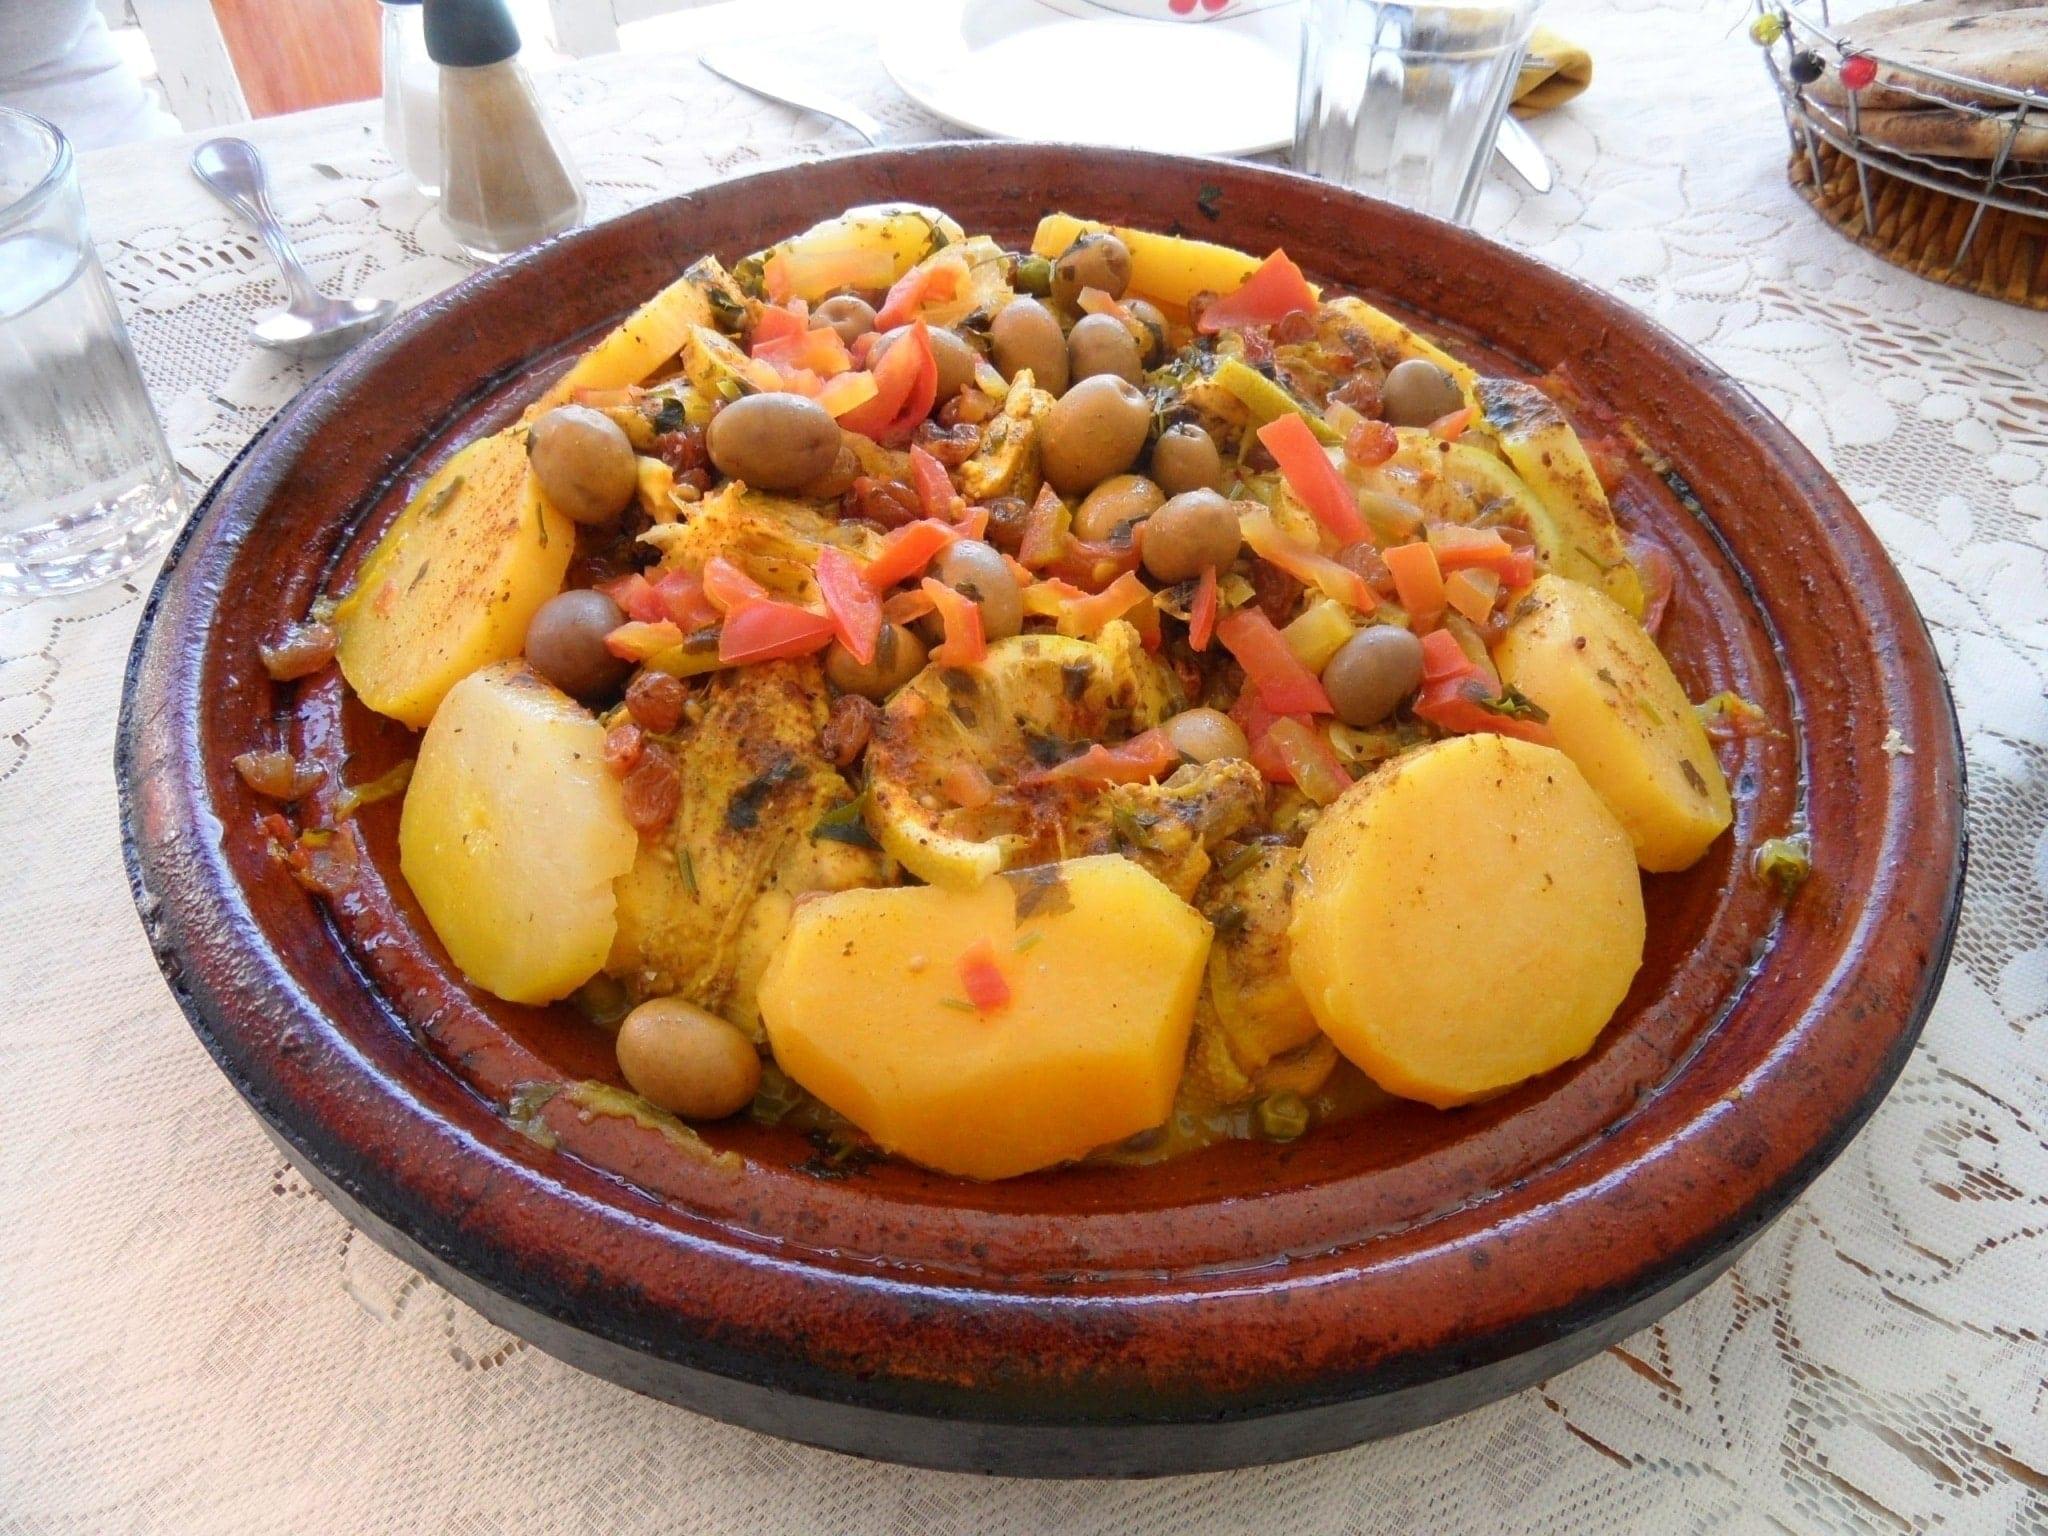 Moroccan Tajine at the restaurant Camping Aourir